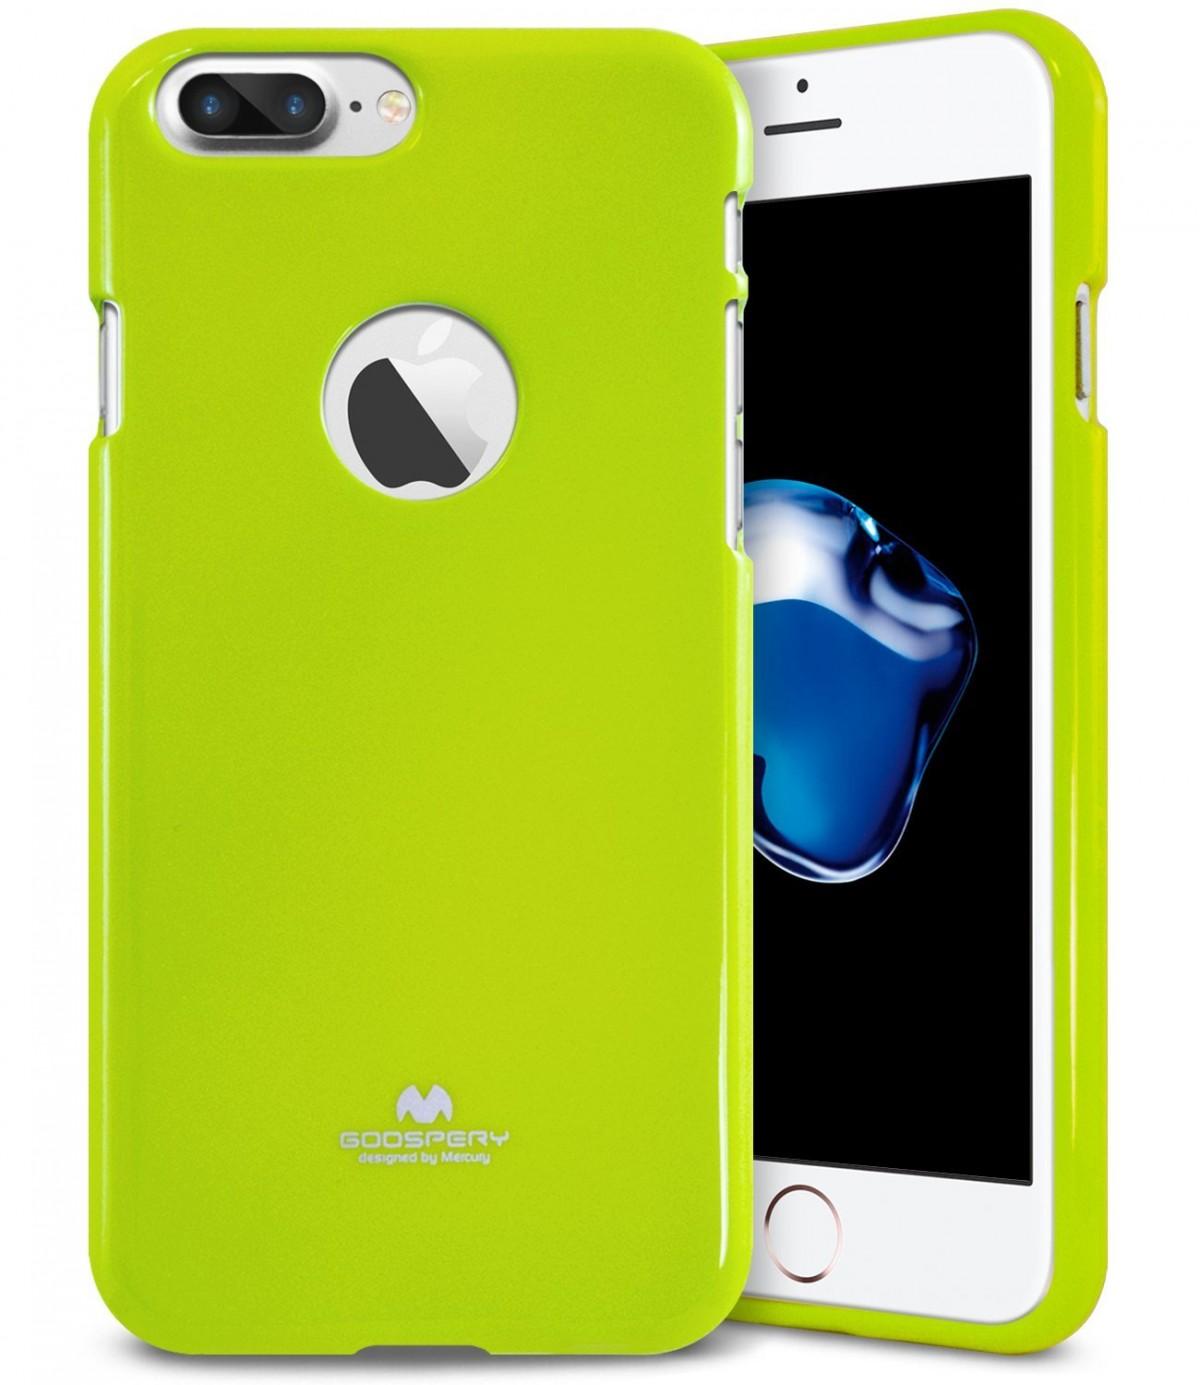 Silikonový obal / kryt Goospery Mercury pro Apple iPhone 8 Plus - Limetkově zelený / Lime